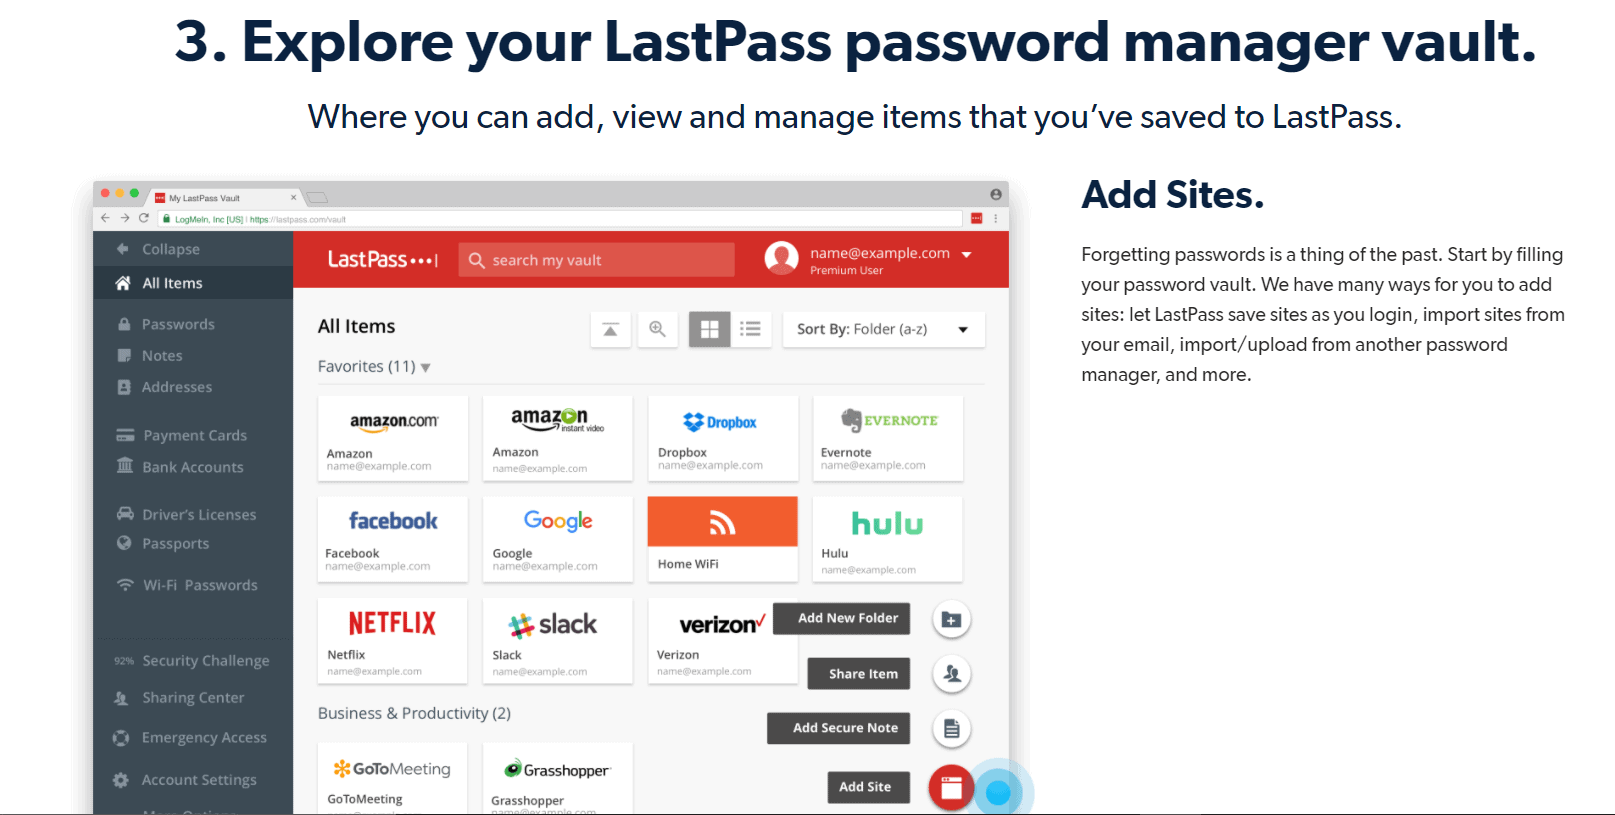 Explore your LastPass password manager vault